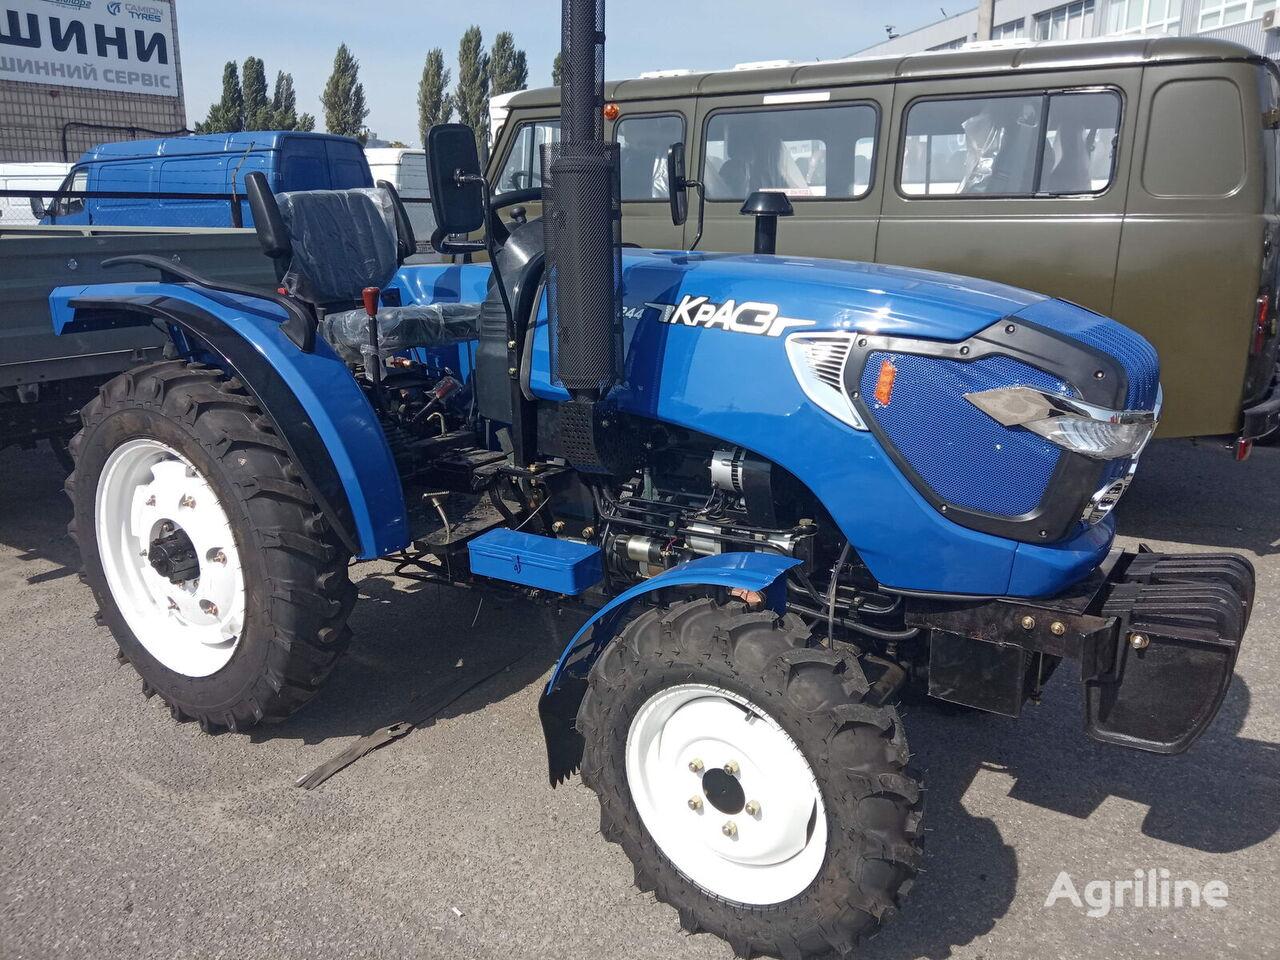 neuer KRASZ 244 Kompakttraktor